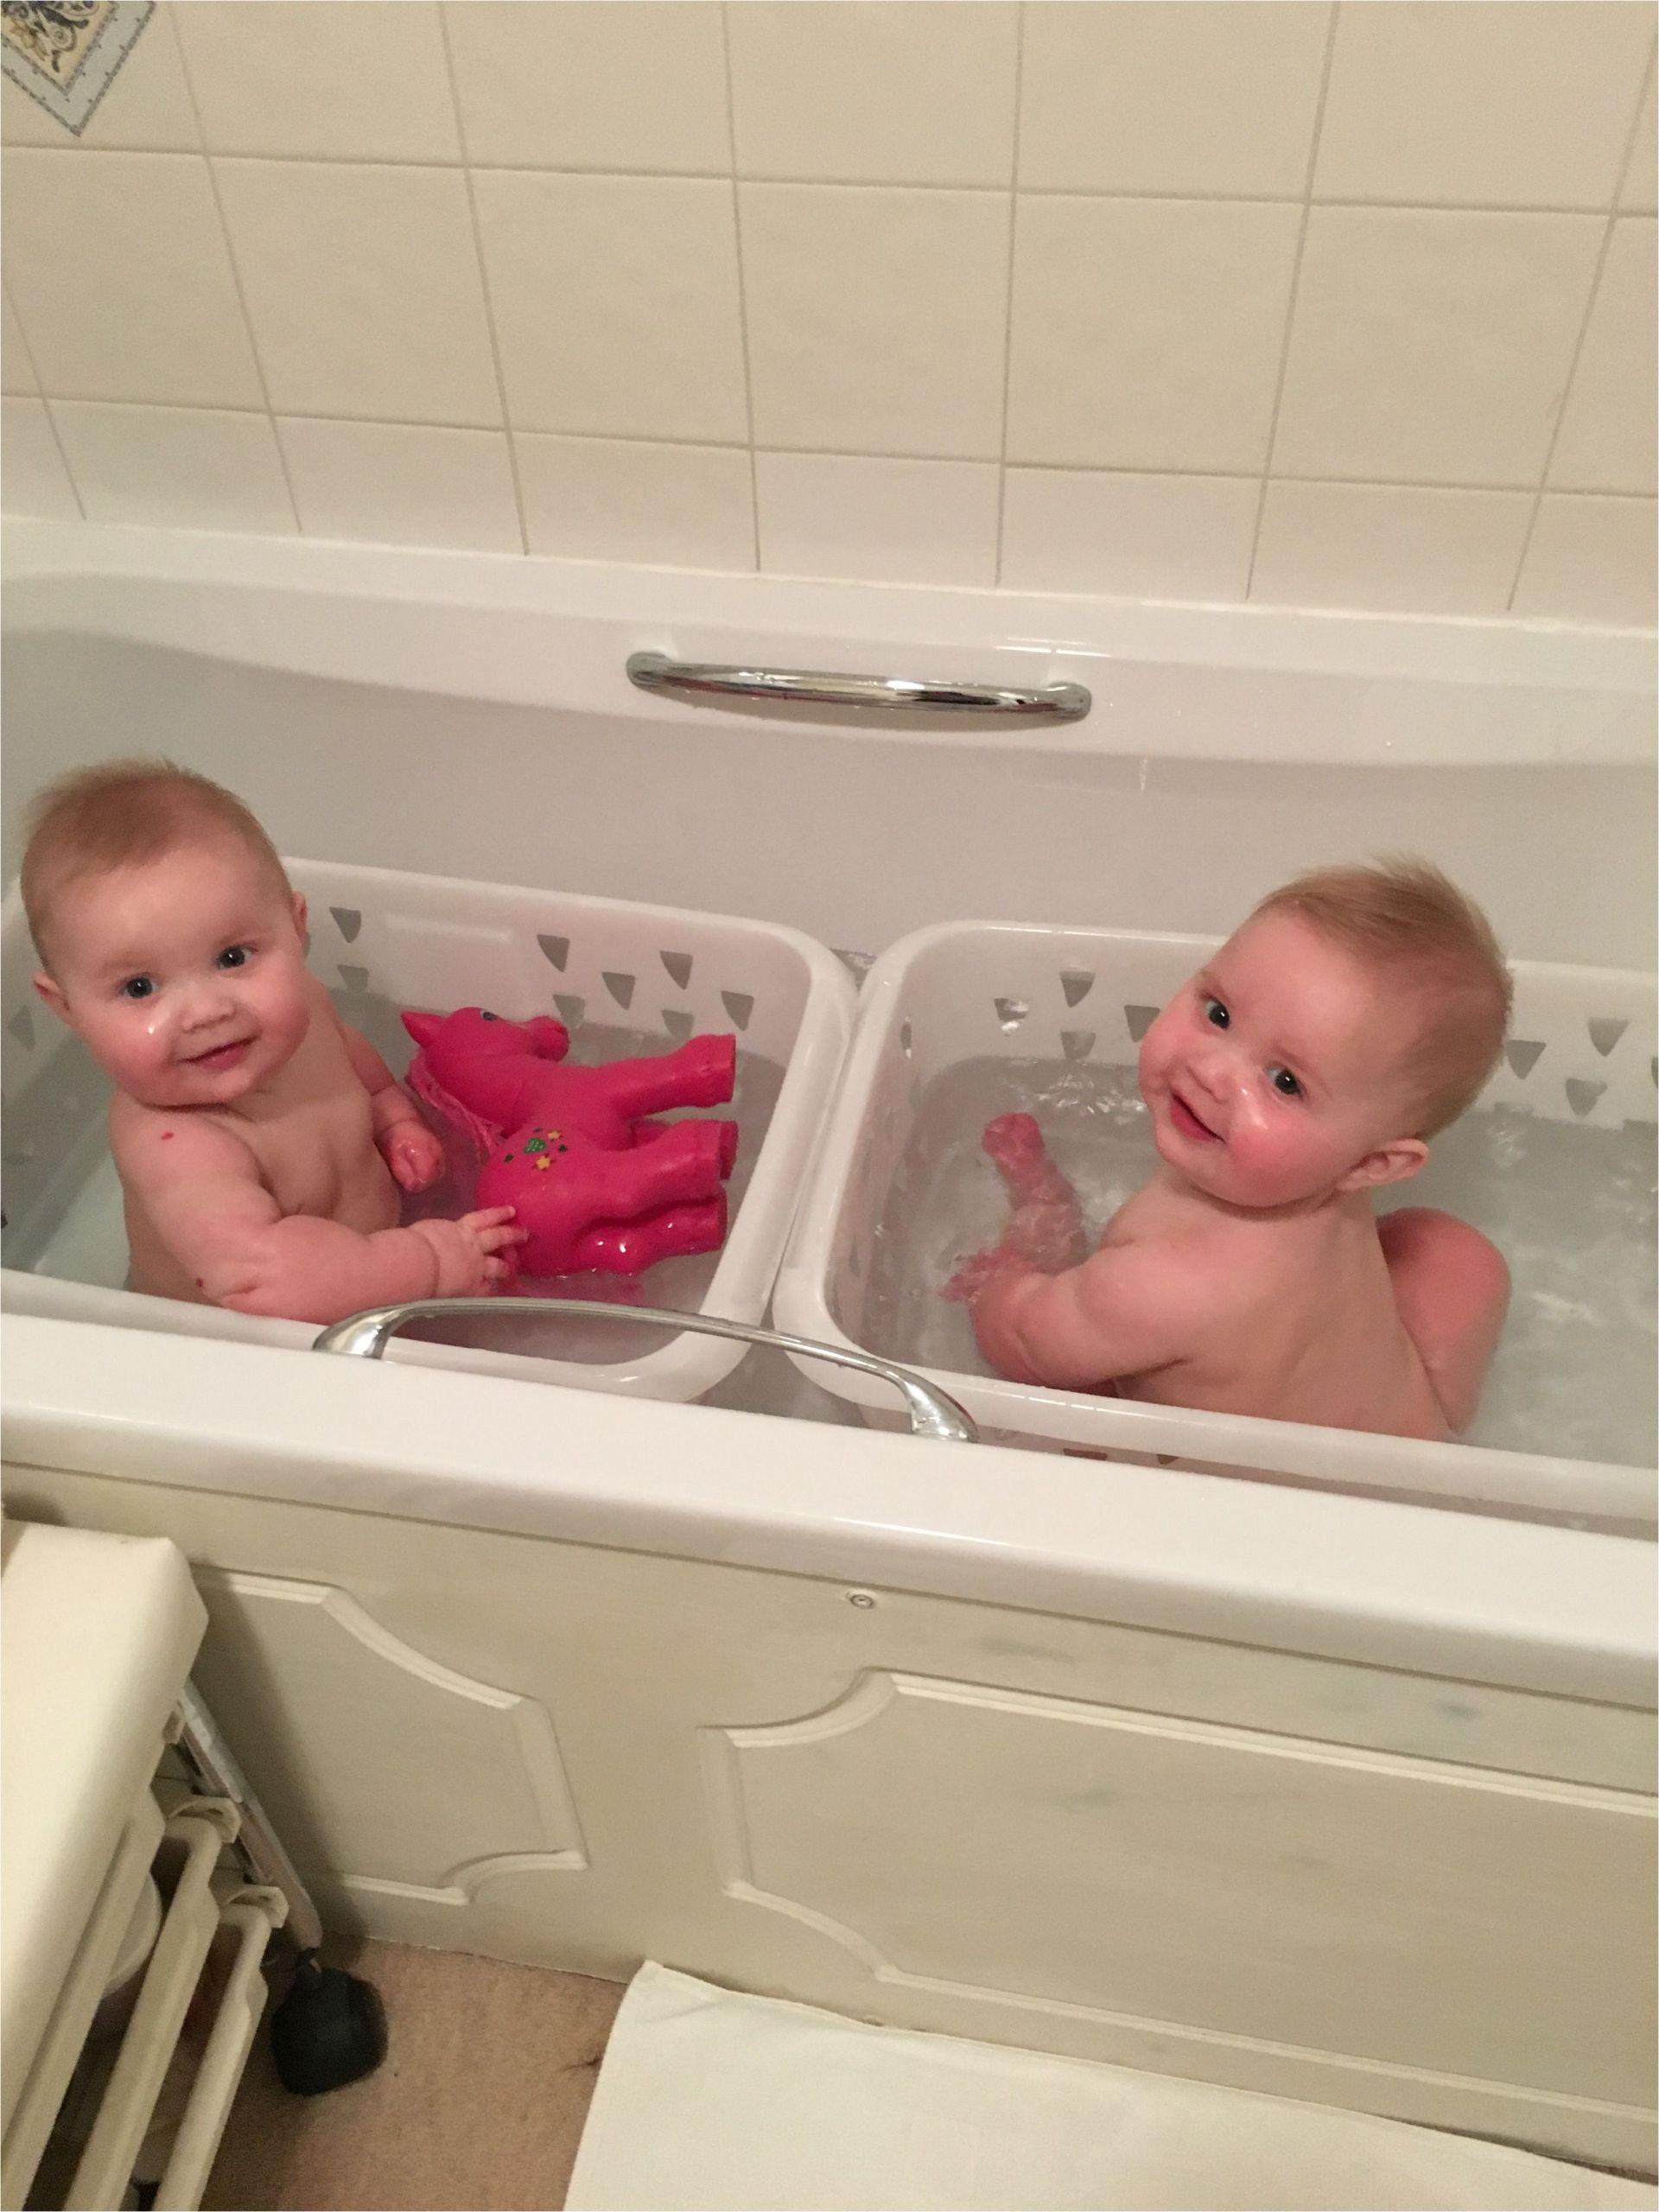 Best Baby Seat for Bathtub Makeshift Baby Bath Seats Babies